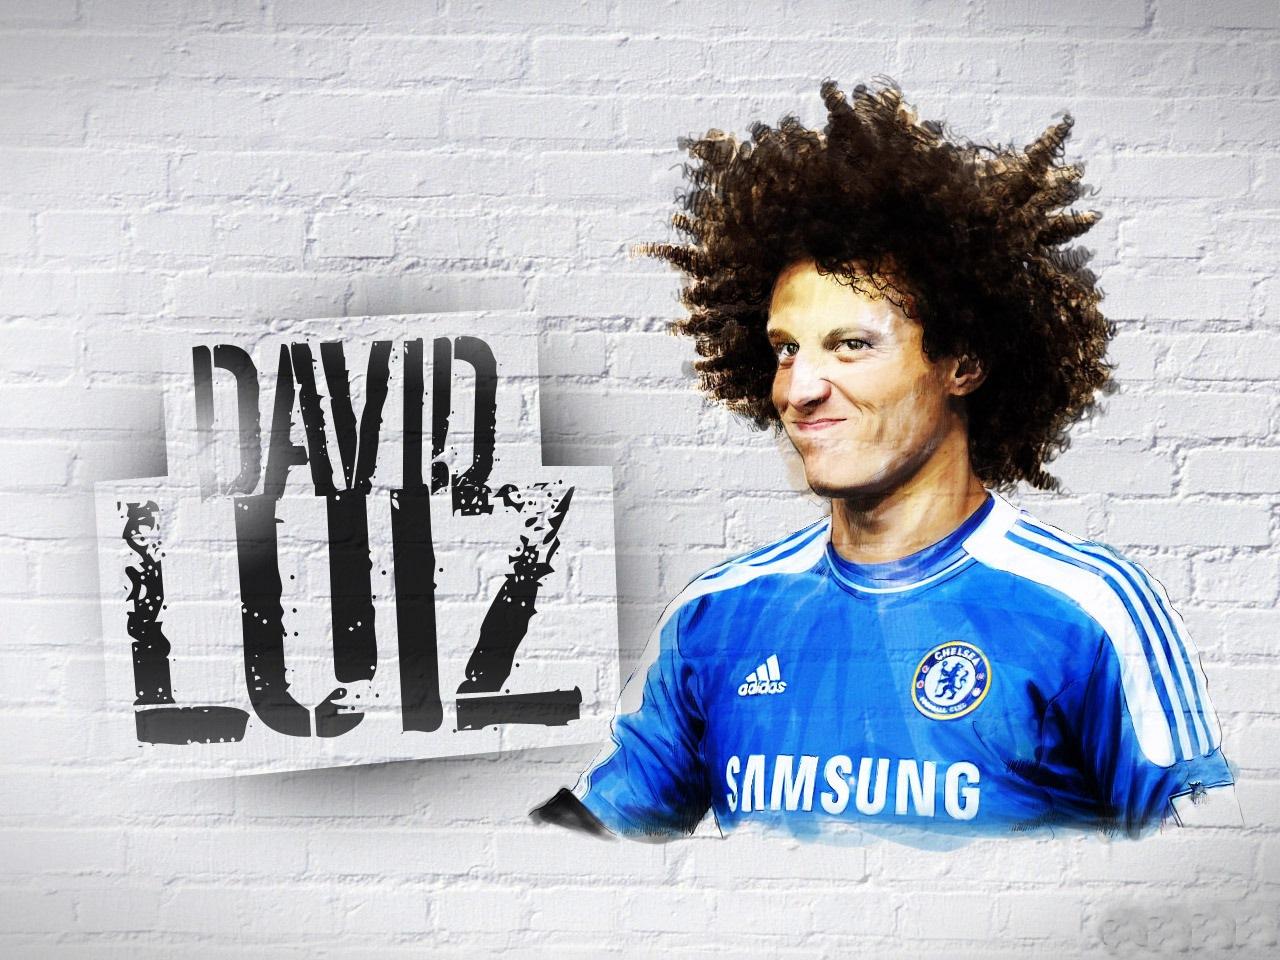 World Sports Hd Wallpapers: David Luiz Hd Wallpapers